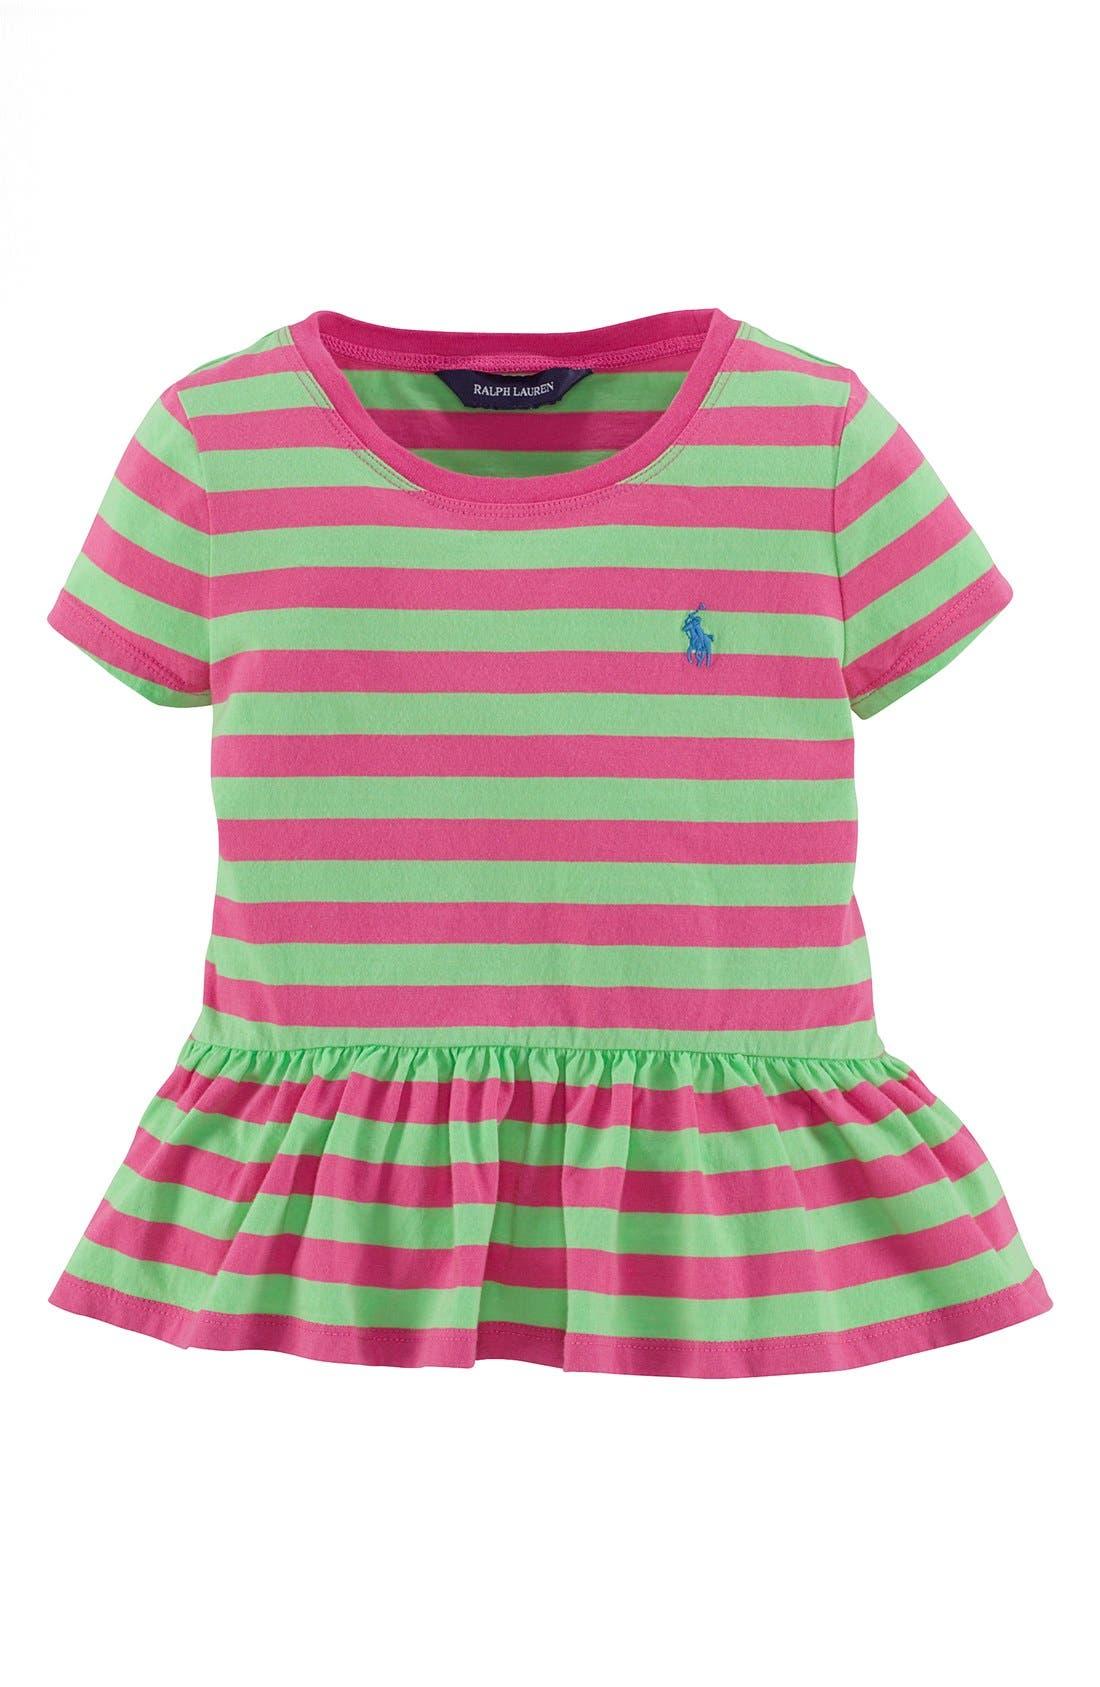 Main Image - Ralph Lauren Stripe Peplum Tee (Toddler Girls)